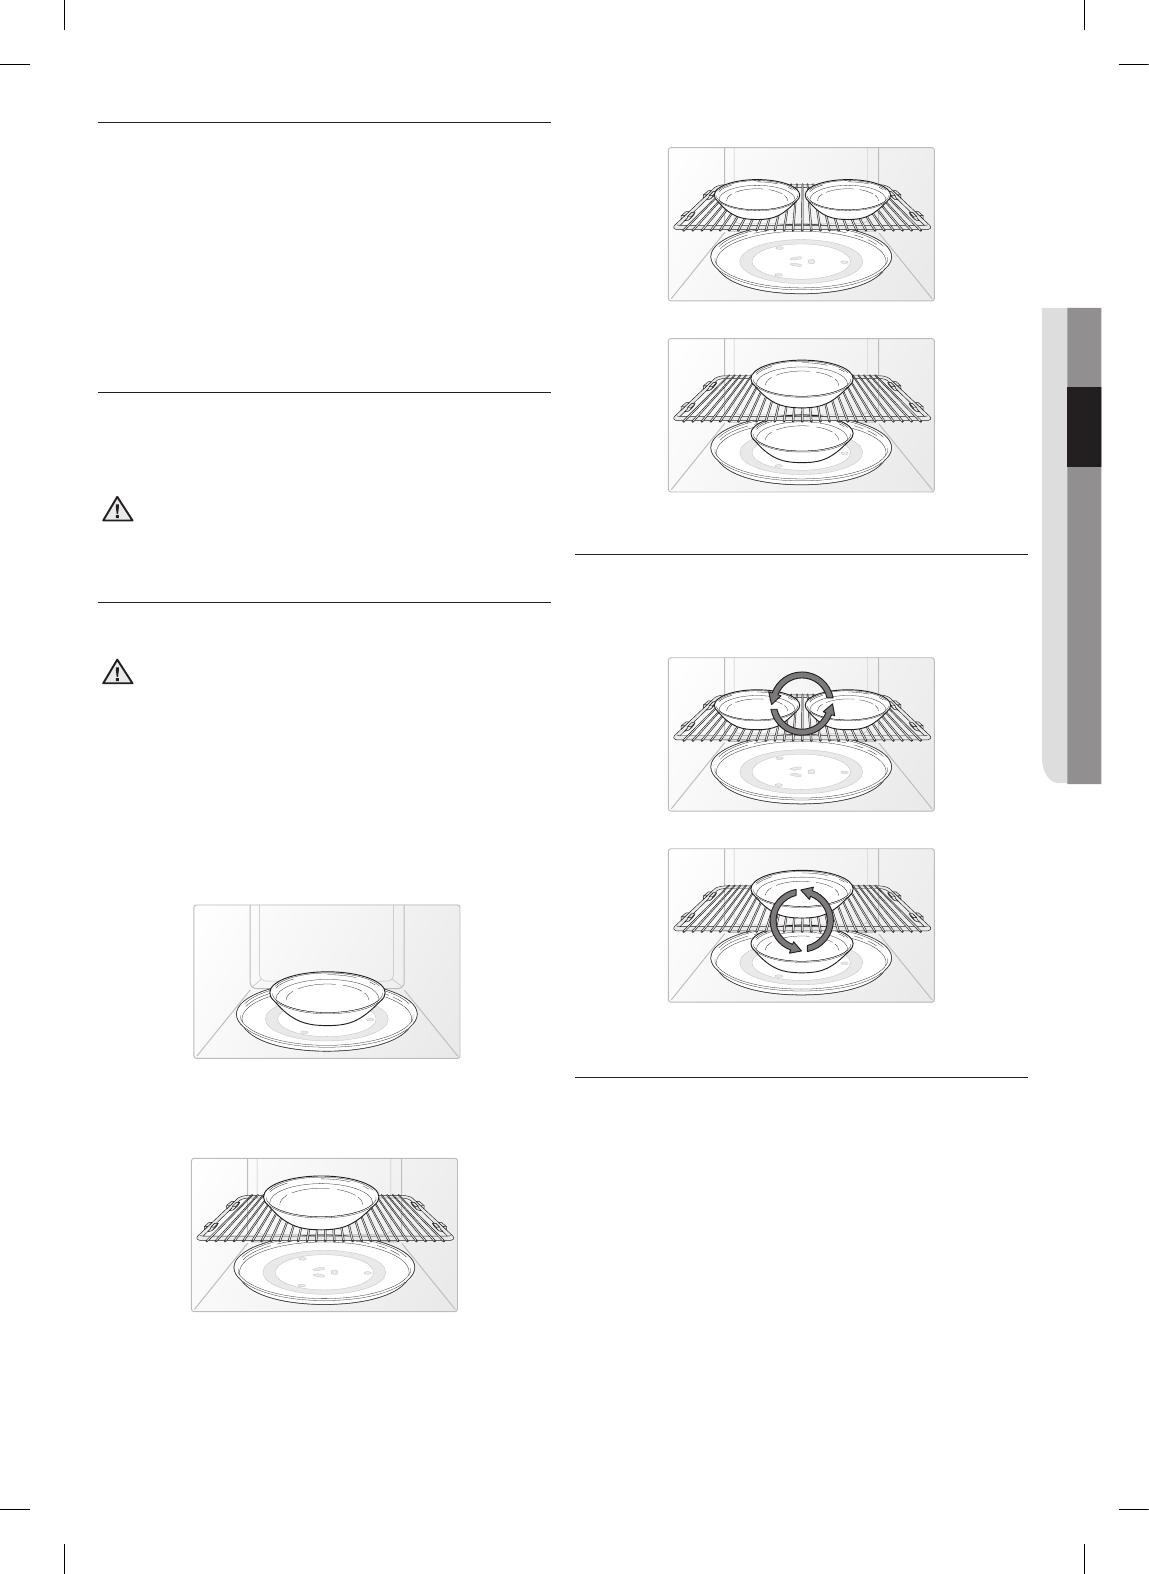 Handleiding Samsung Me18h704sf Pagina 11 Van 56 English Me18h704sfs Wiring Diagram